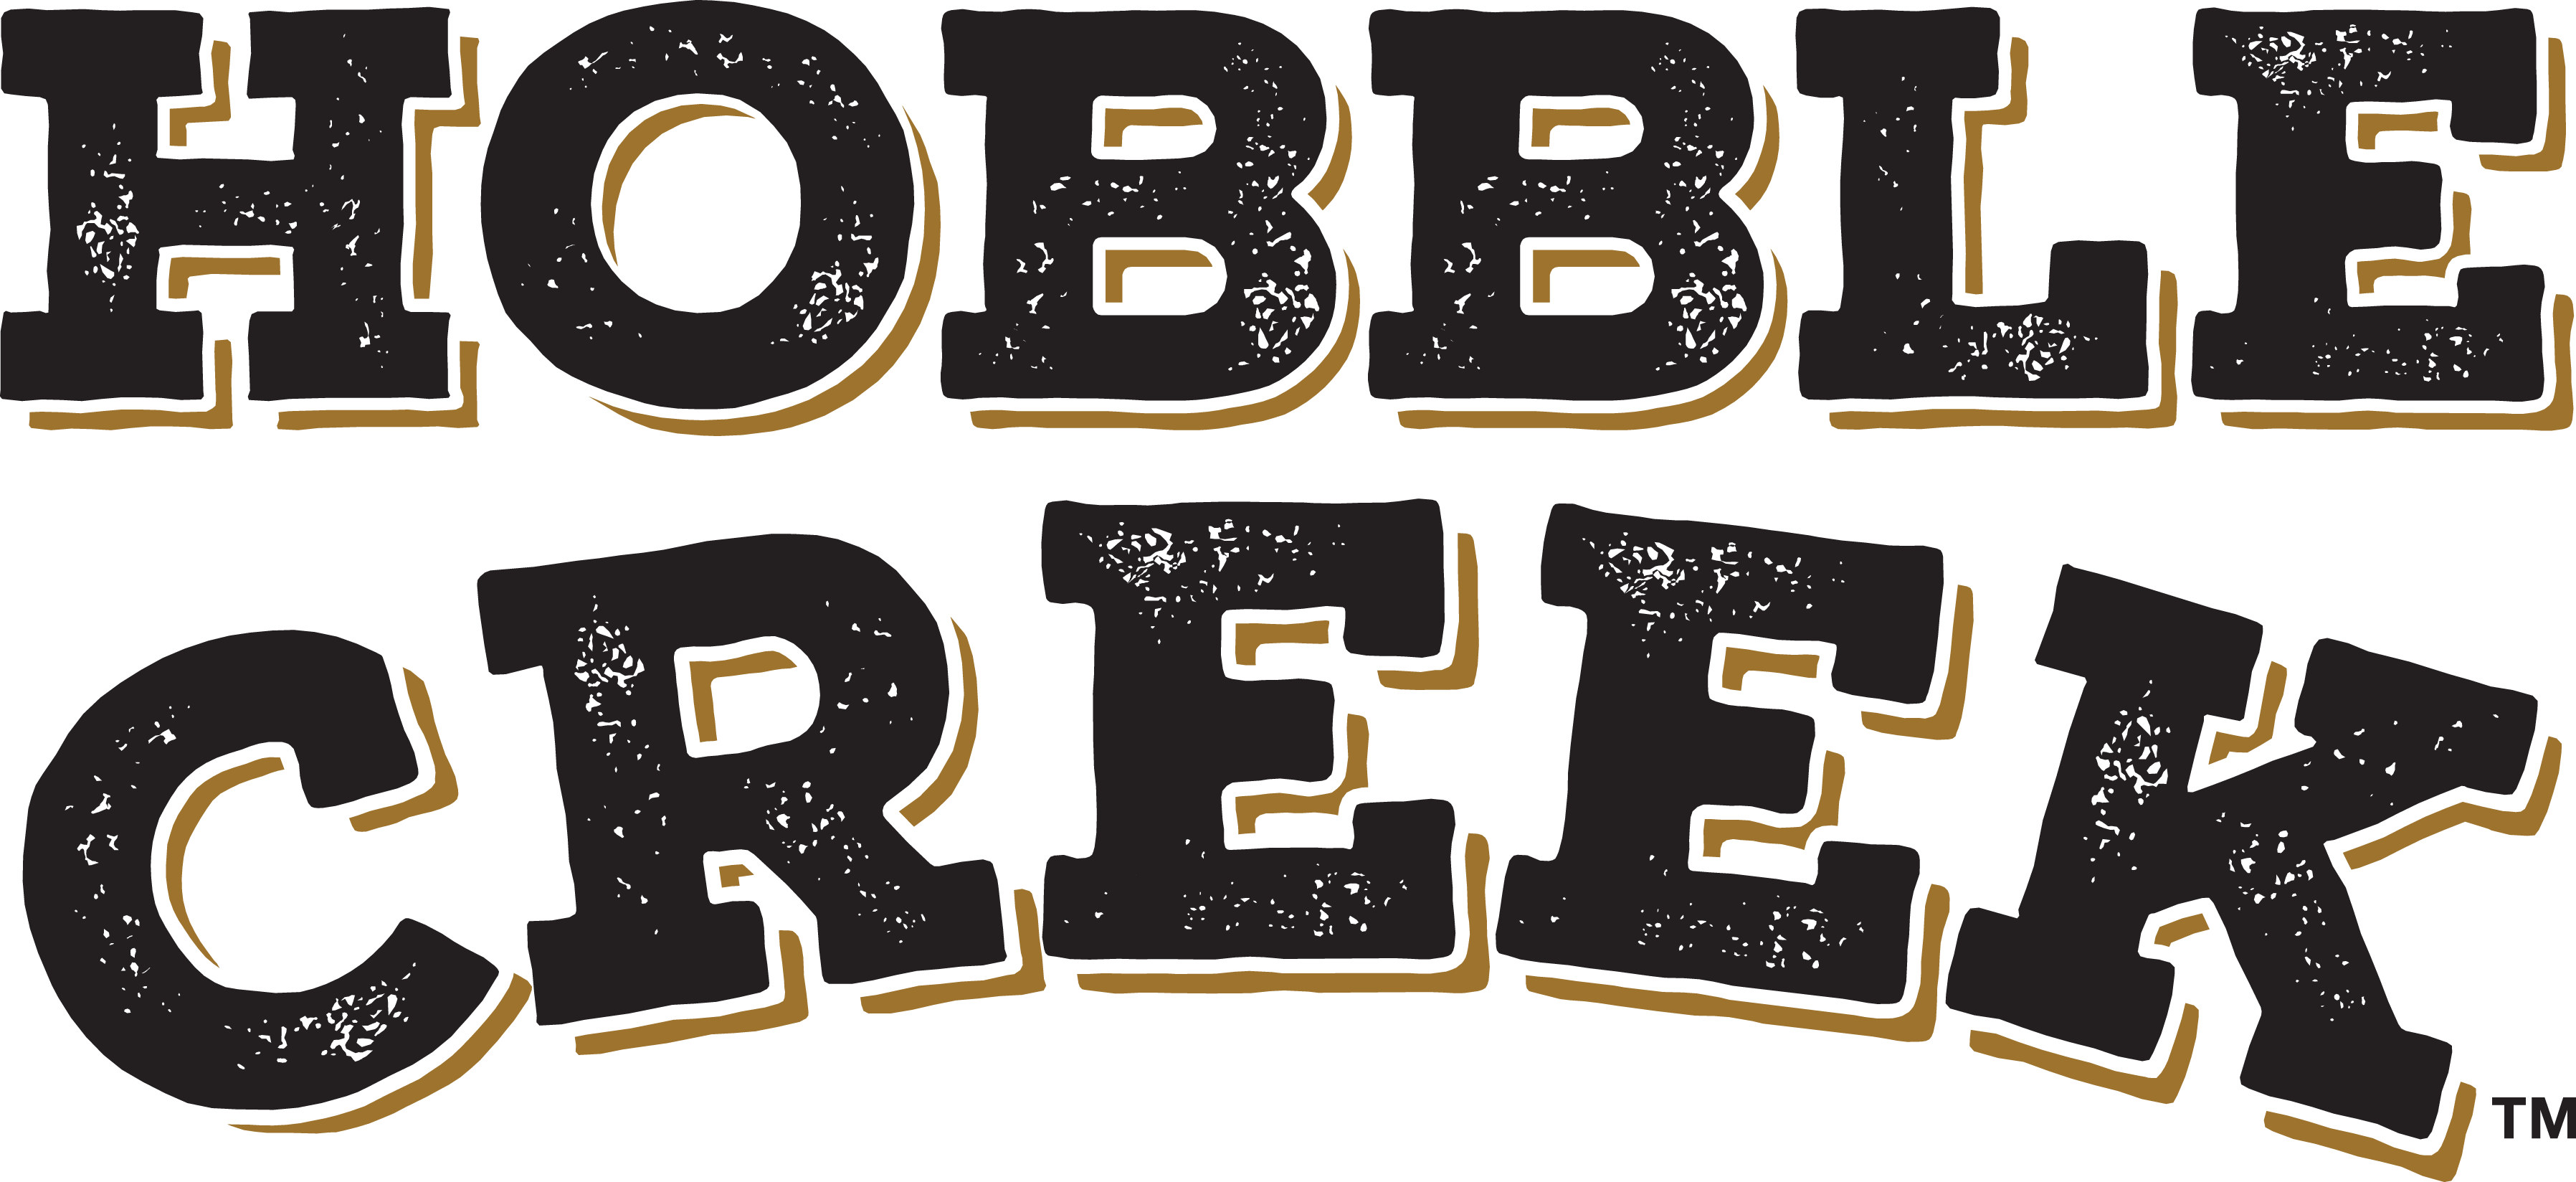 HOBBLE CREEK WINE-BASED WHISKEY